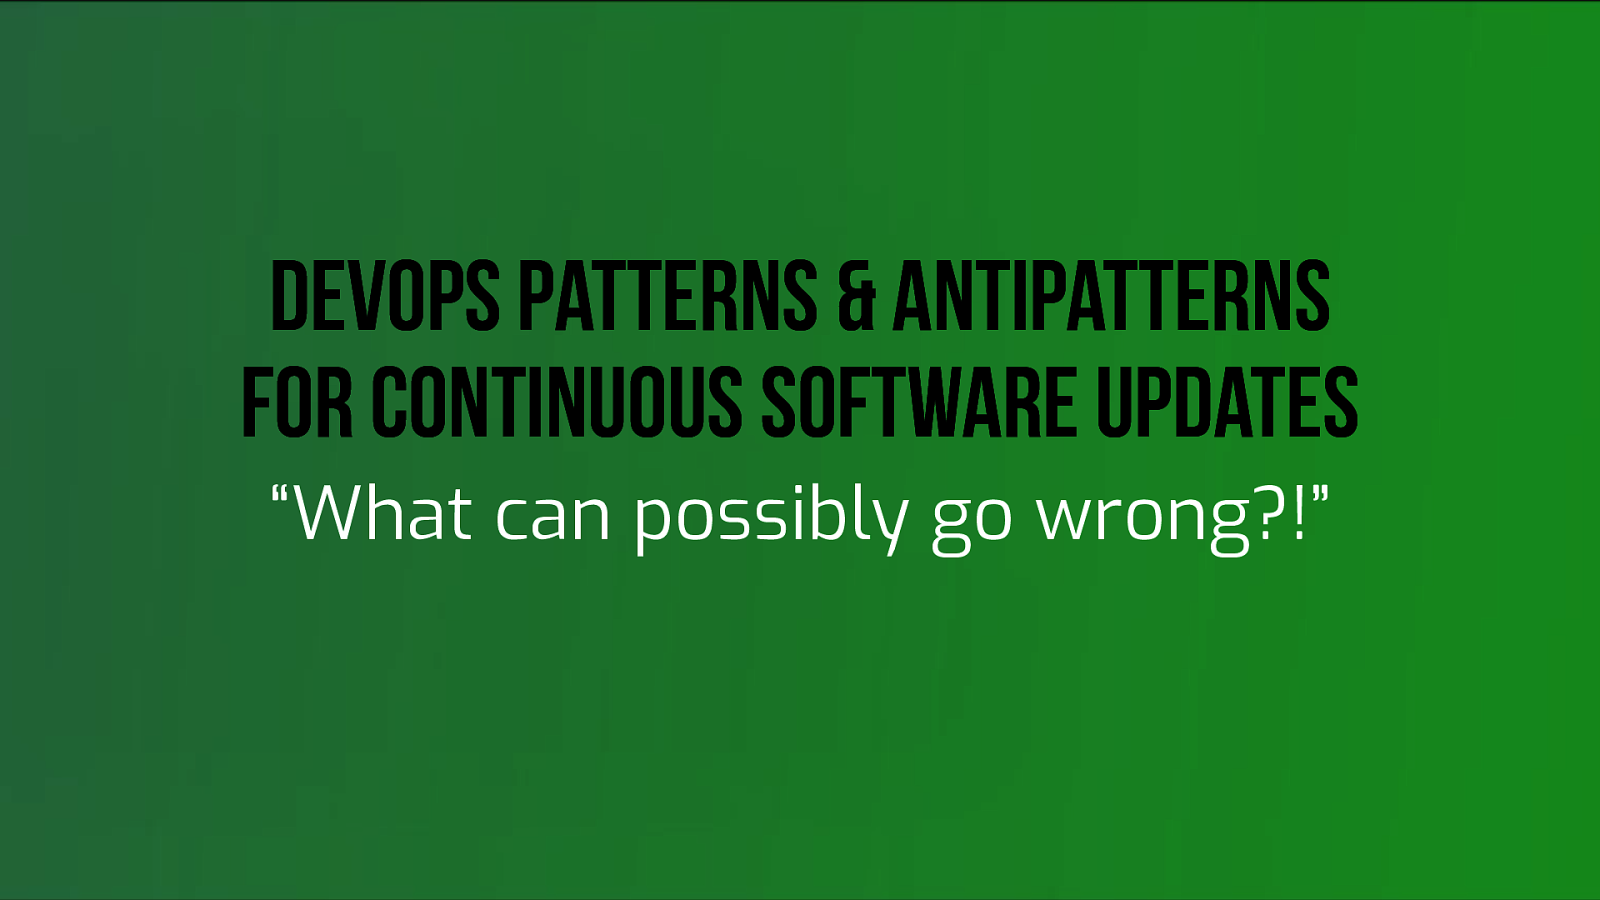 DevOps Patterns & Antipatterns for Continuous Software Updates